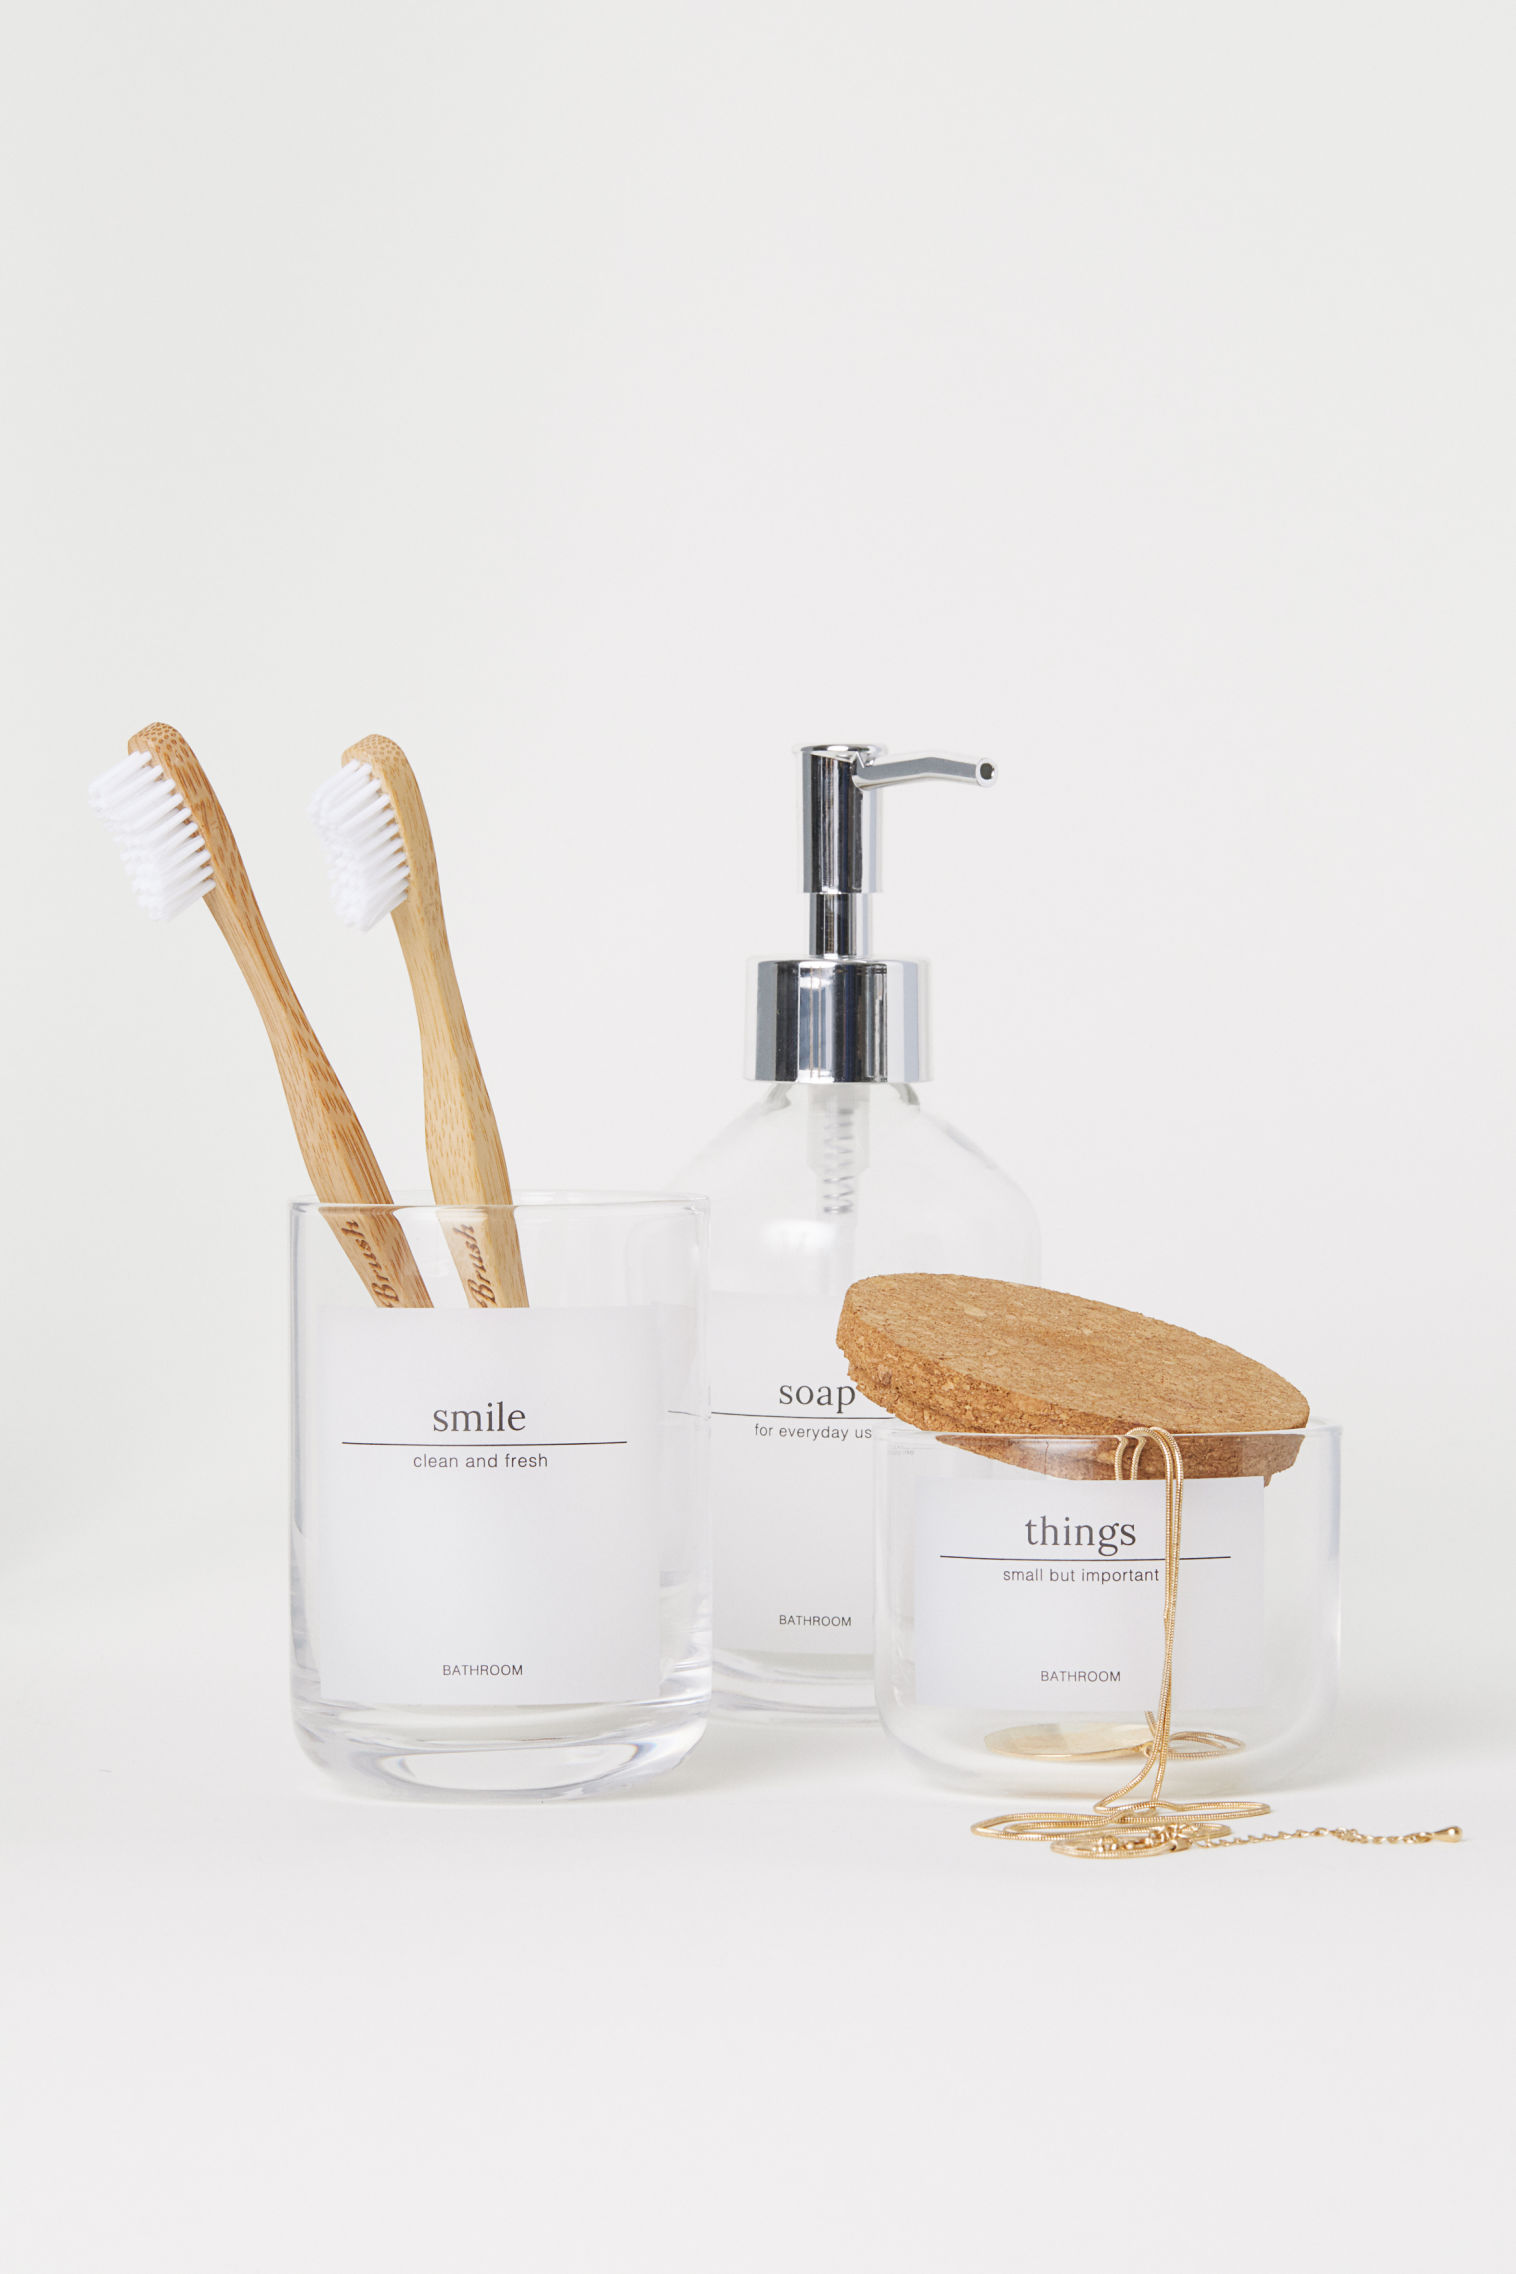 a40bf1cea Small glass jar